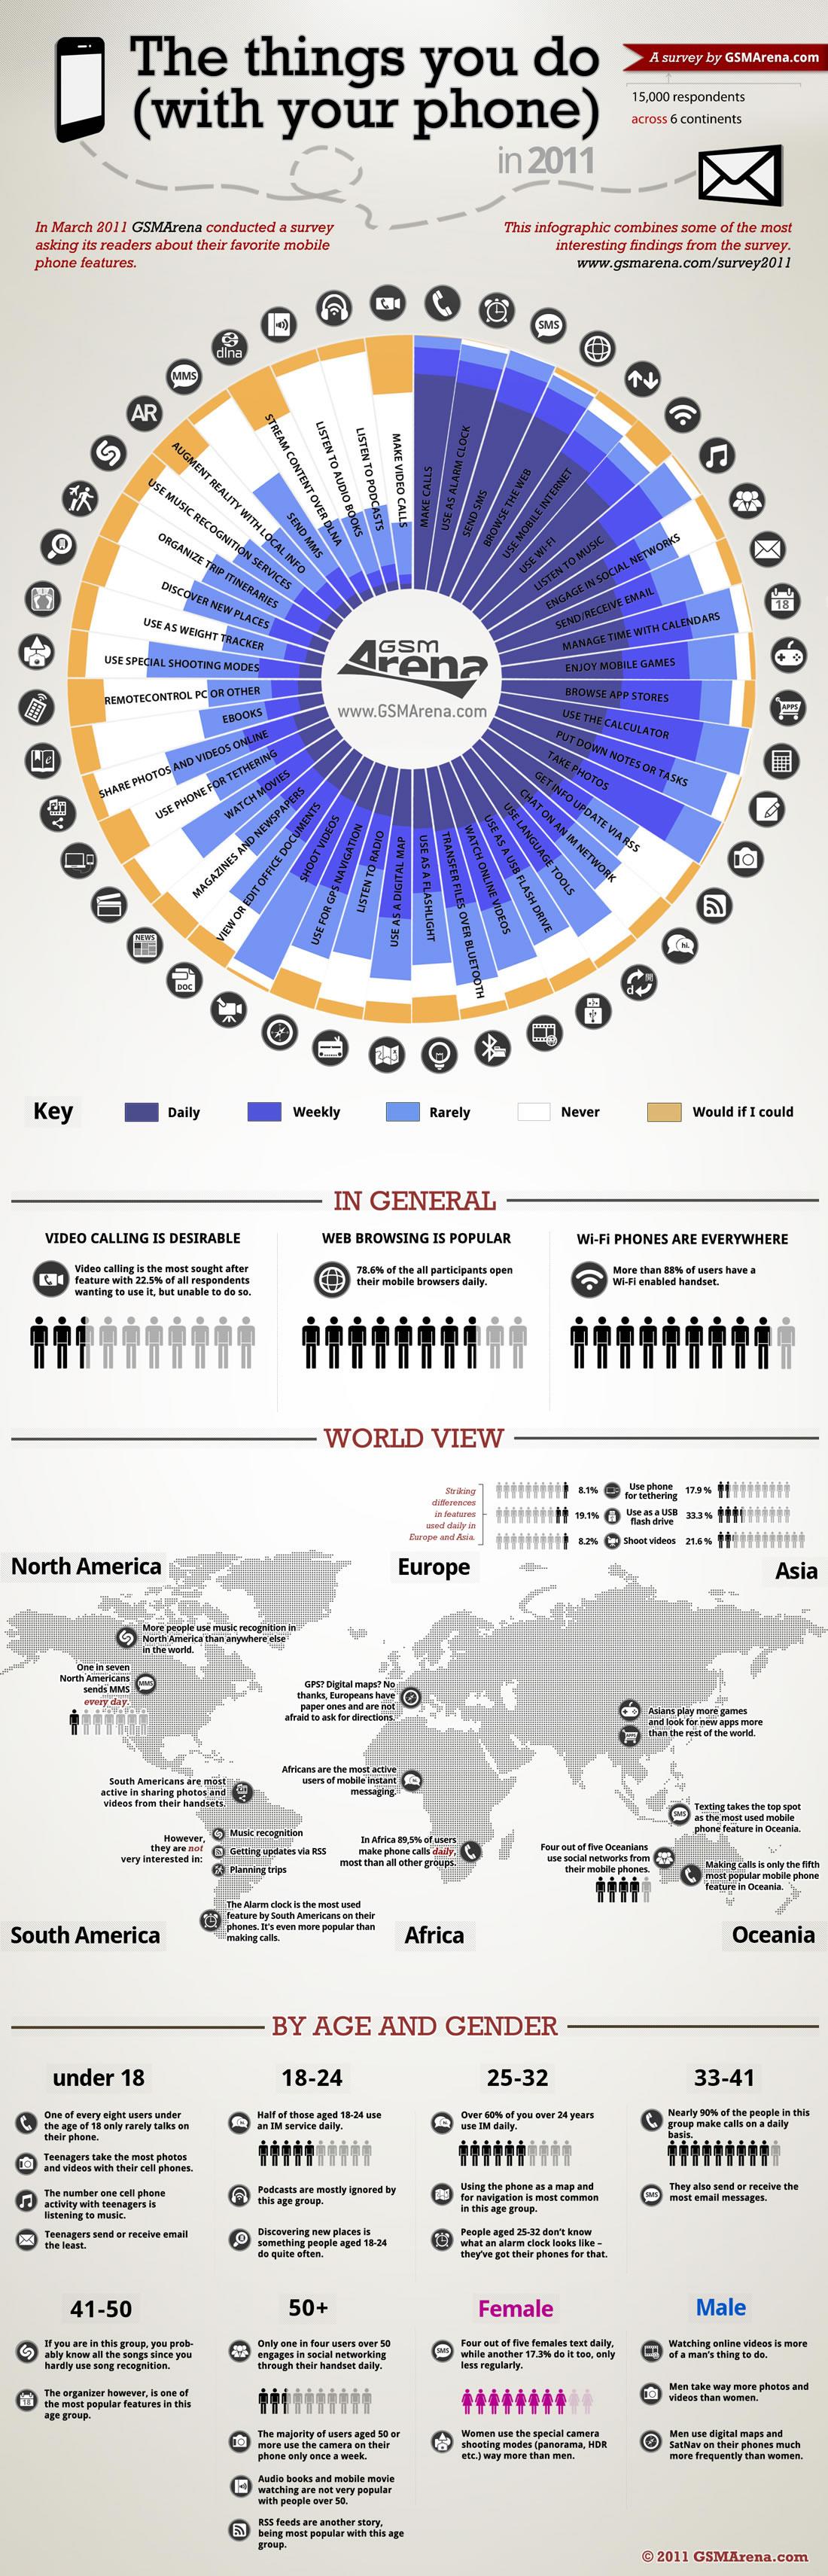 ¿Qué haces con tu teléfono móvil? #infografia #infographic